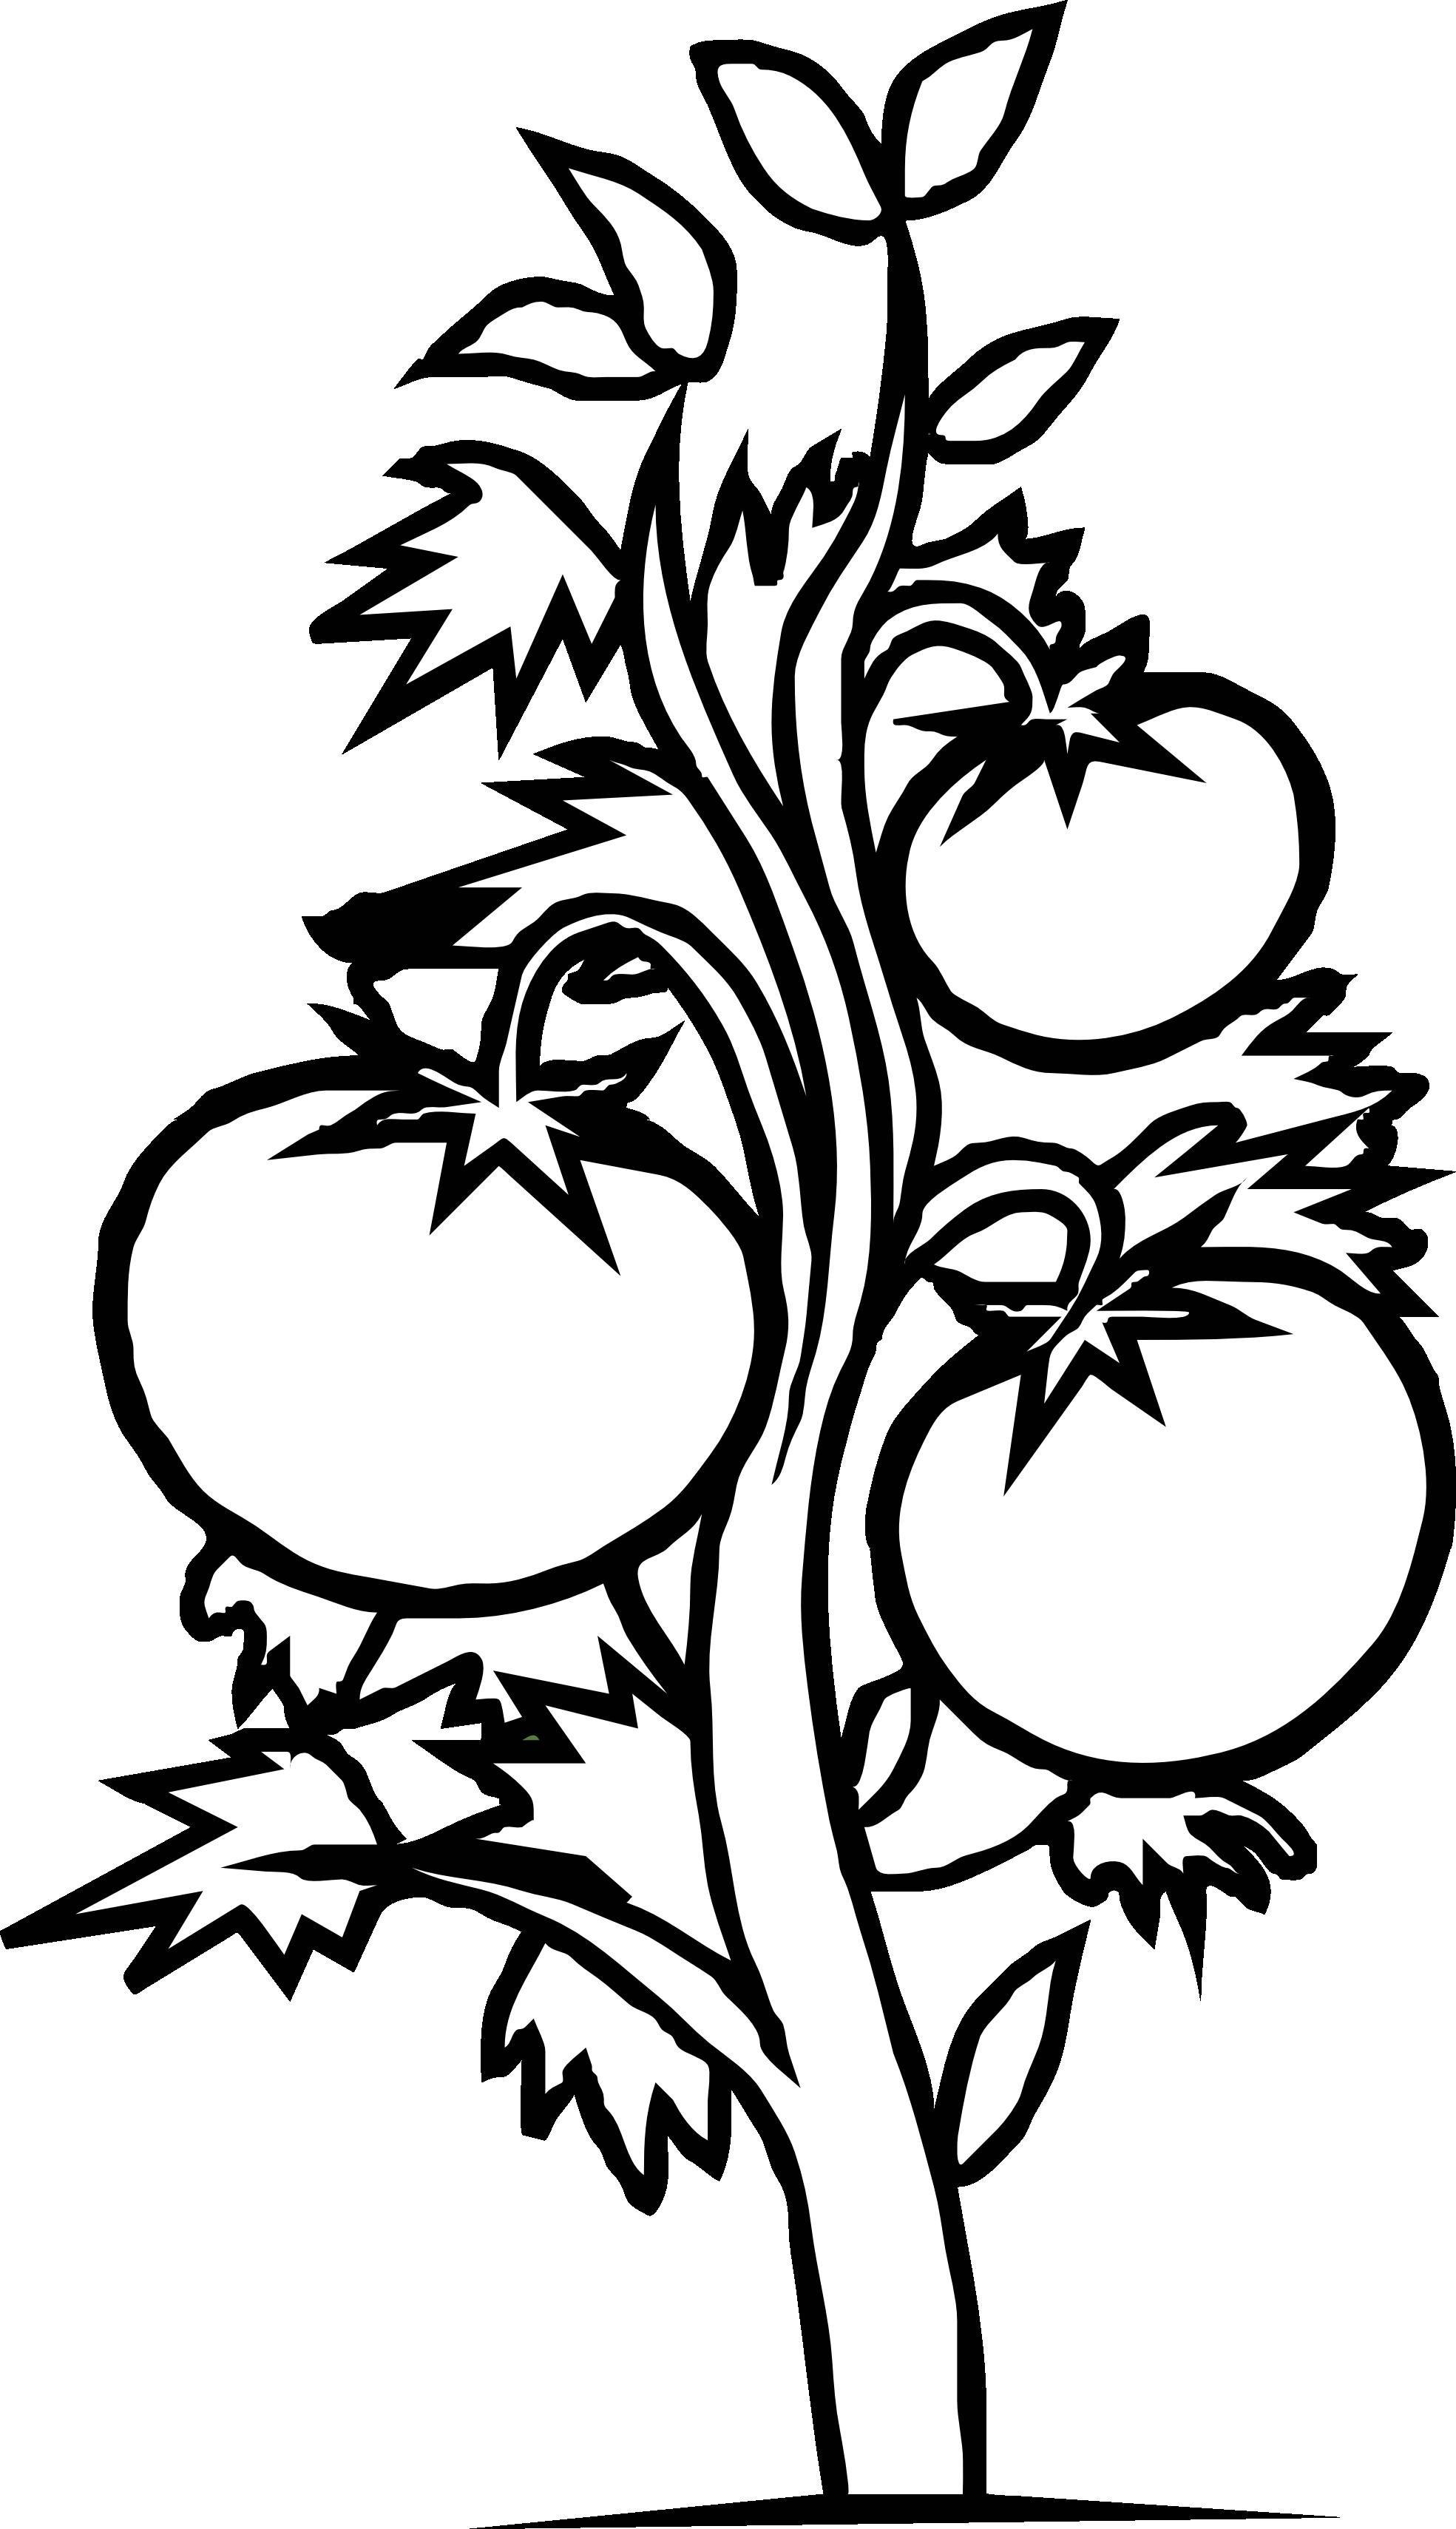 Plant Clipart Black And White Tomato Pla-Plant Clipart Black And White Tomato Plant Black White Line Art-13